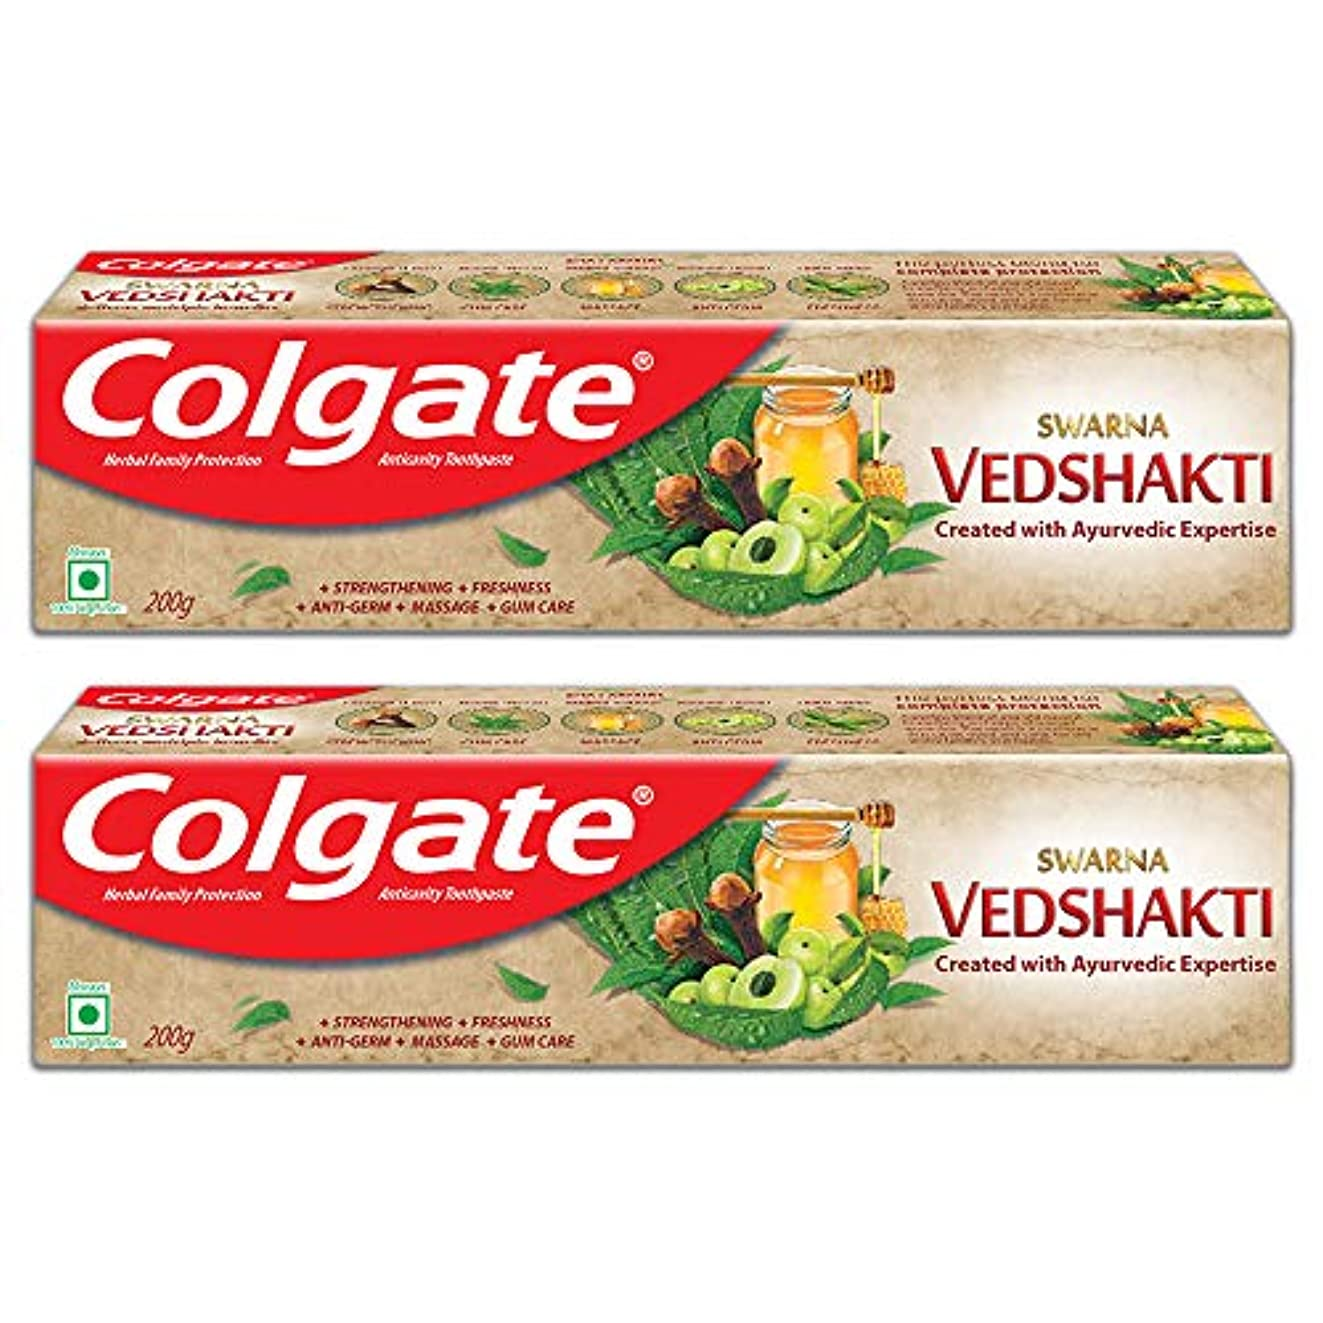 Colgate Swarna Vedshakti Toothpaste - 200gm (Pack of 2)